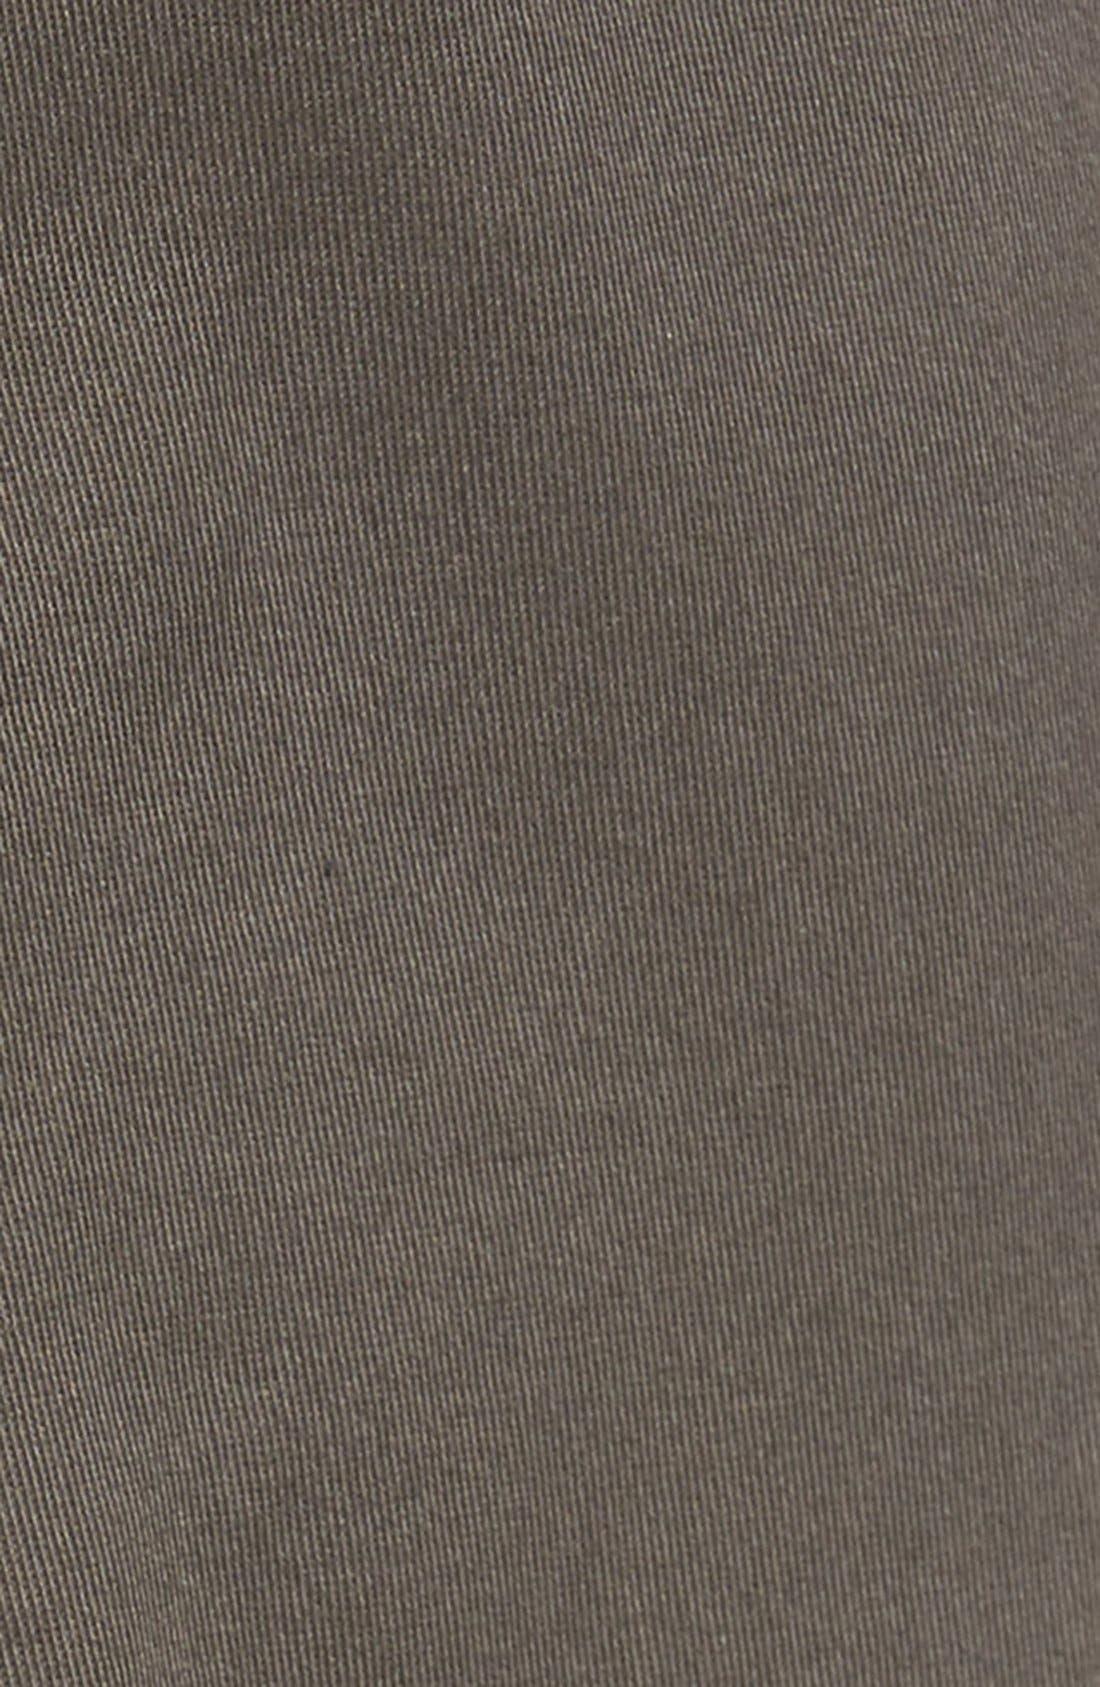 Soho Slim Fit Five-Pocket Pants,                             Alternate thumbnail 6, color,                             GREY